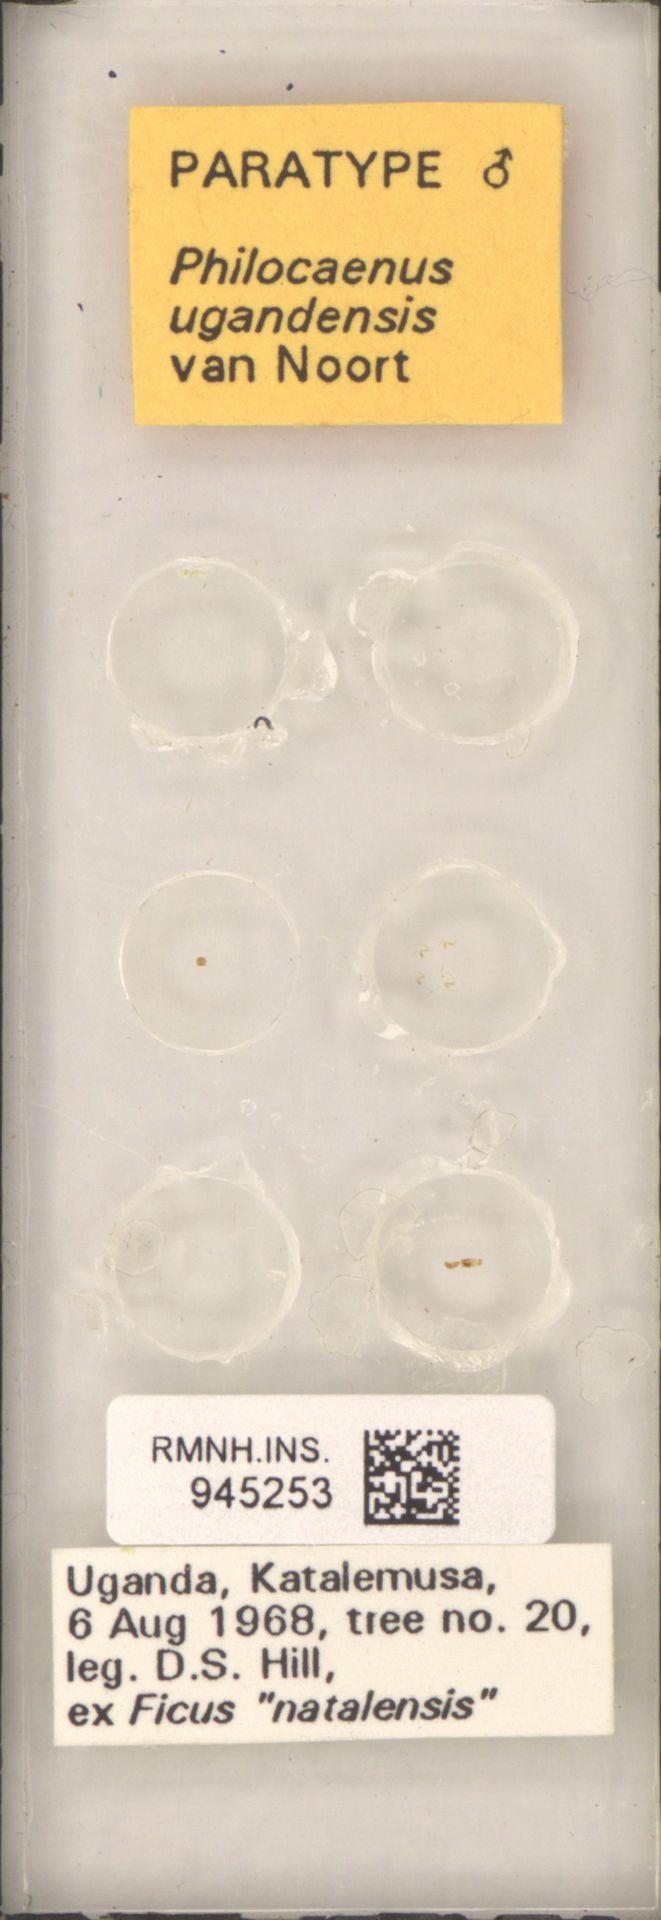 RMNH.INS.945253 | Philocaenus ugandensis van Noort